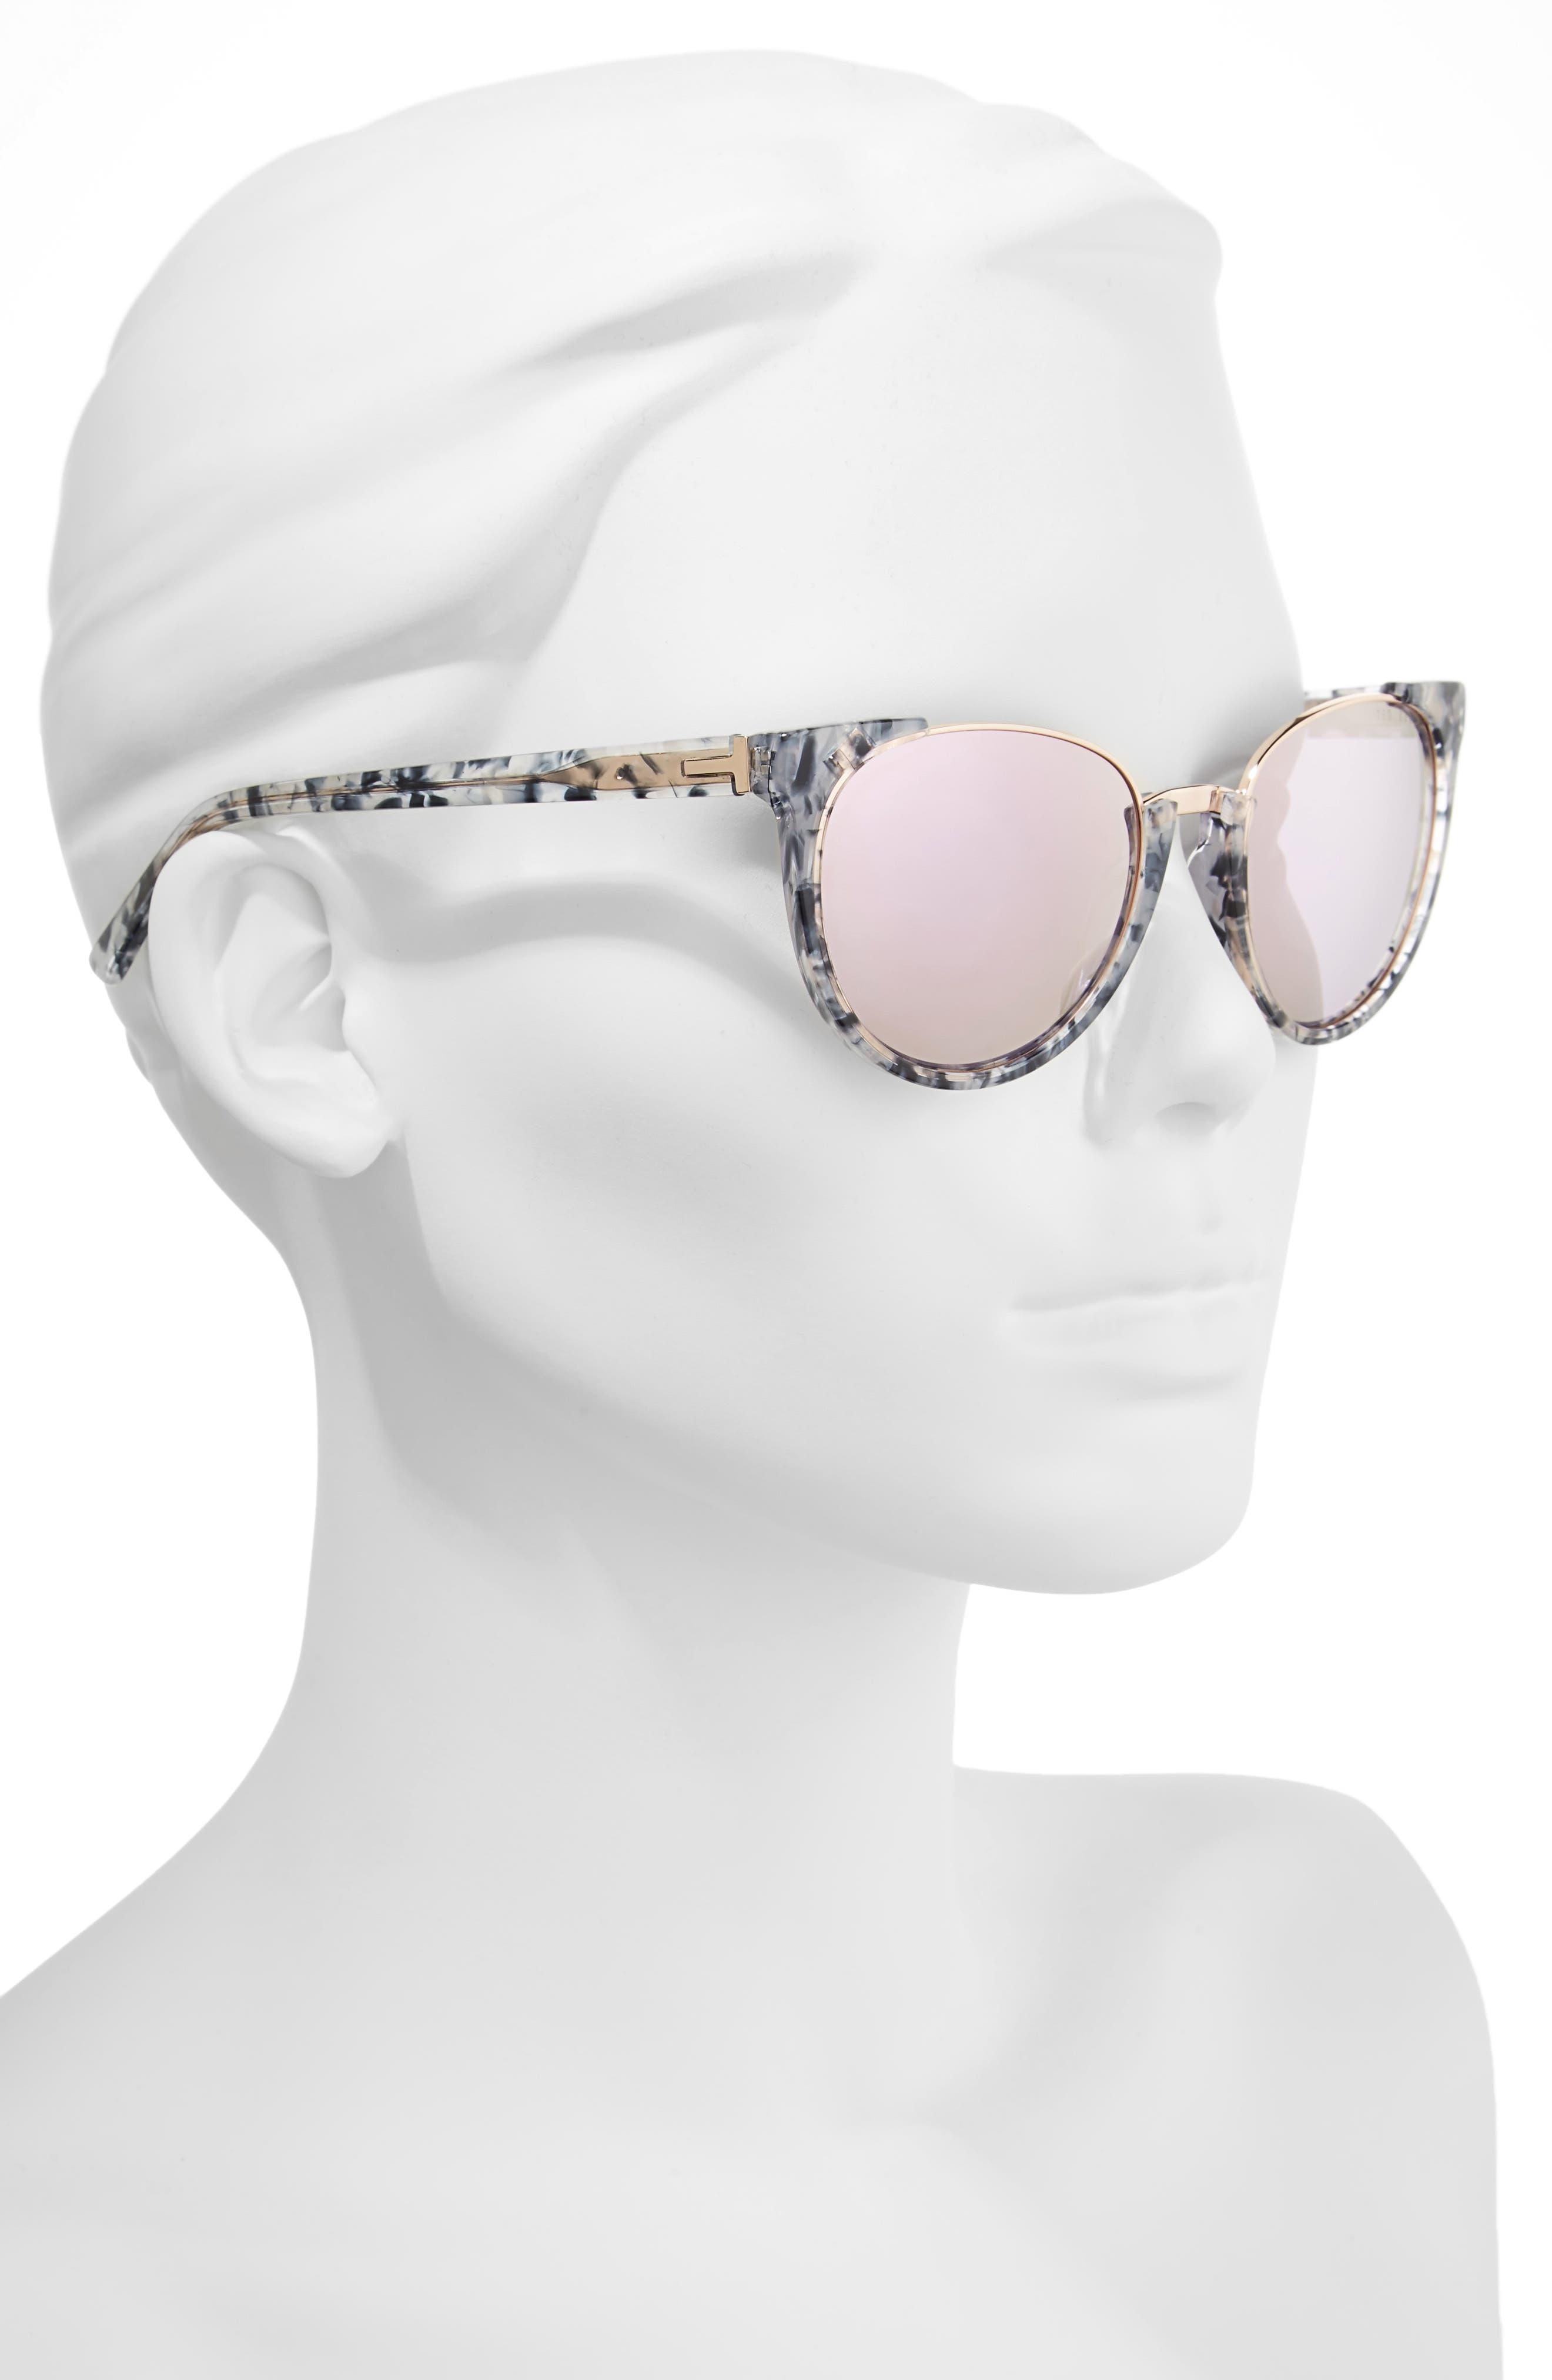 53mm Modified Oval Sunglasses,                             Alternate thumbnail 2, color,                             Blue